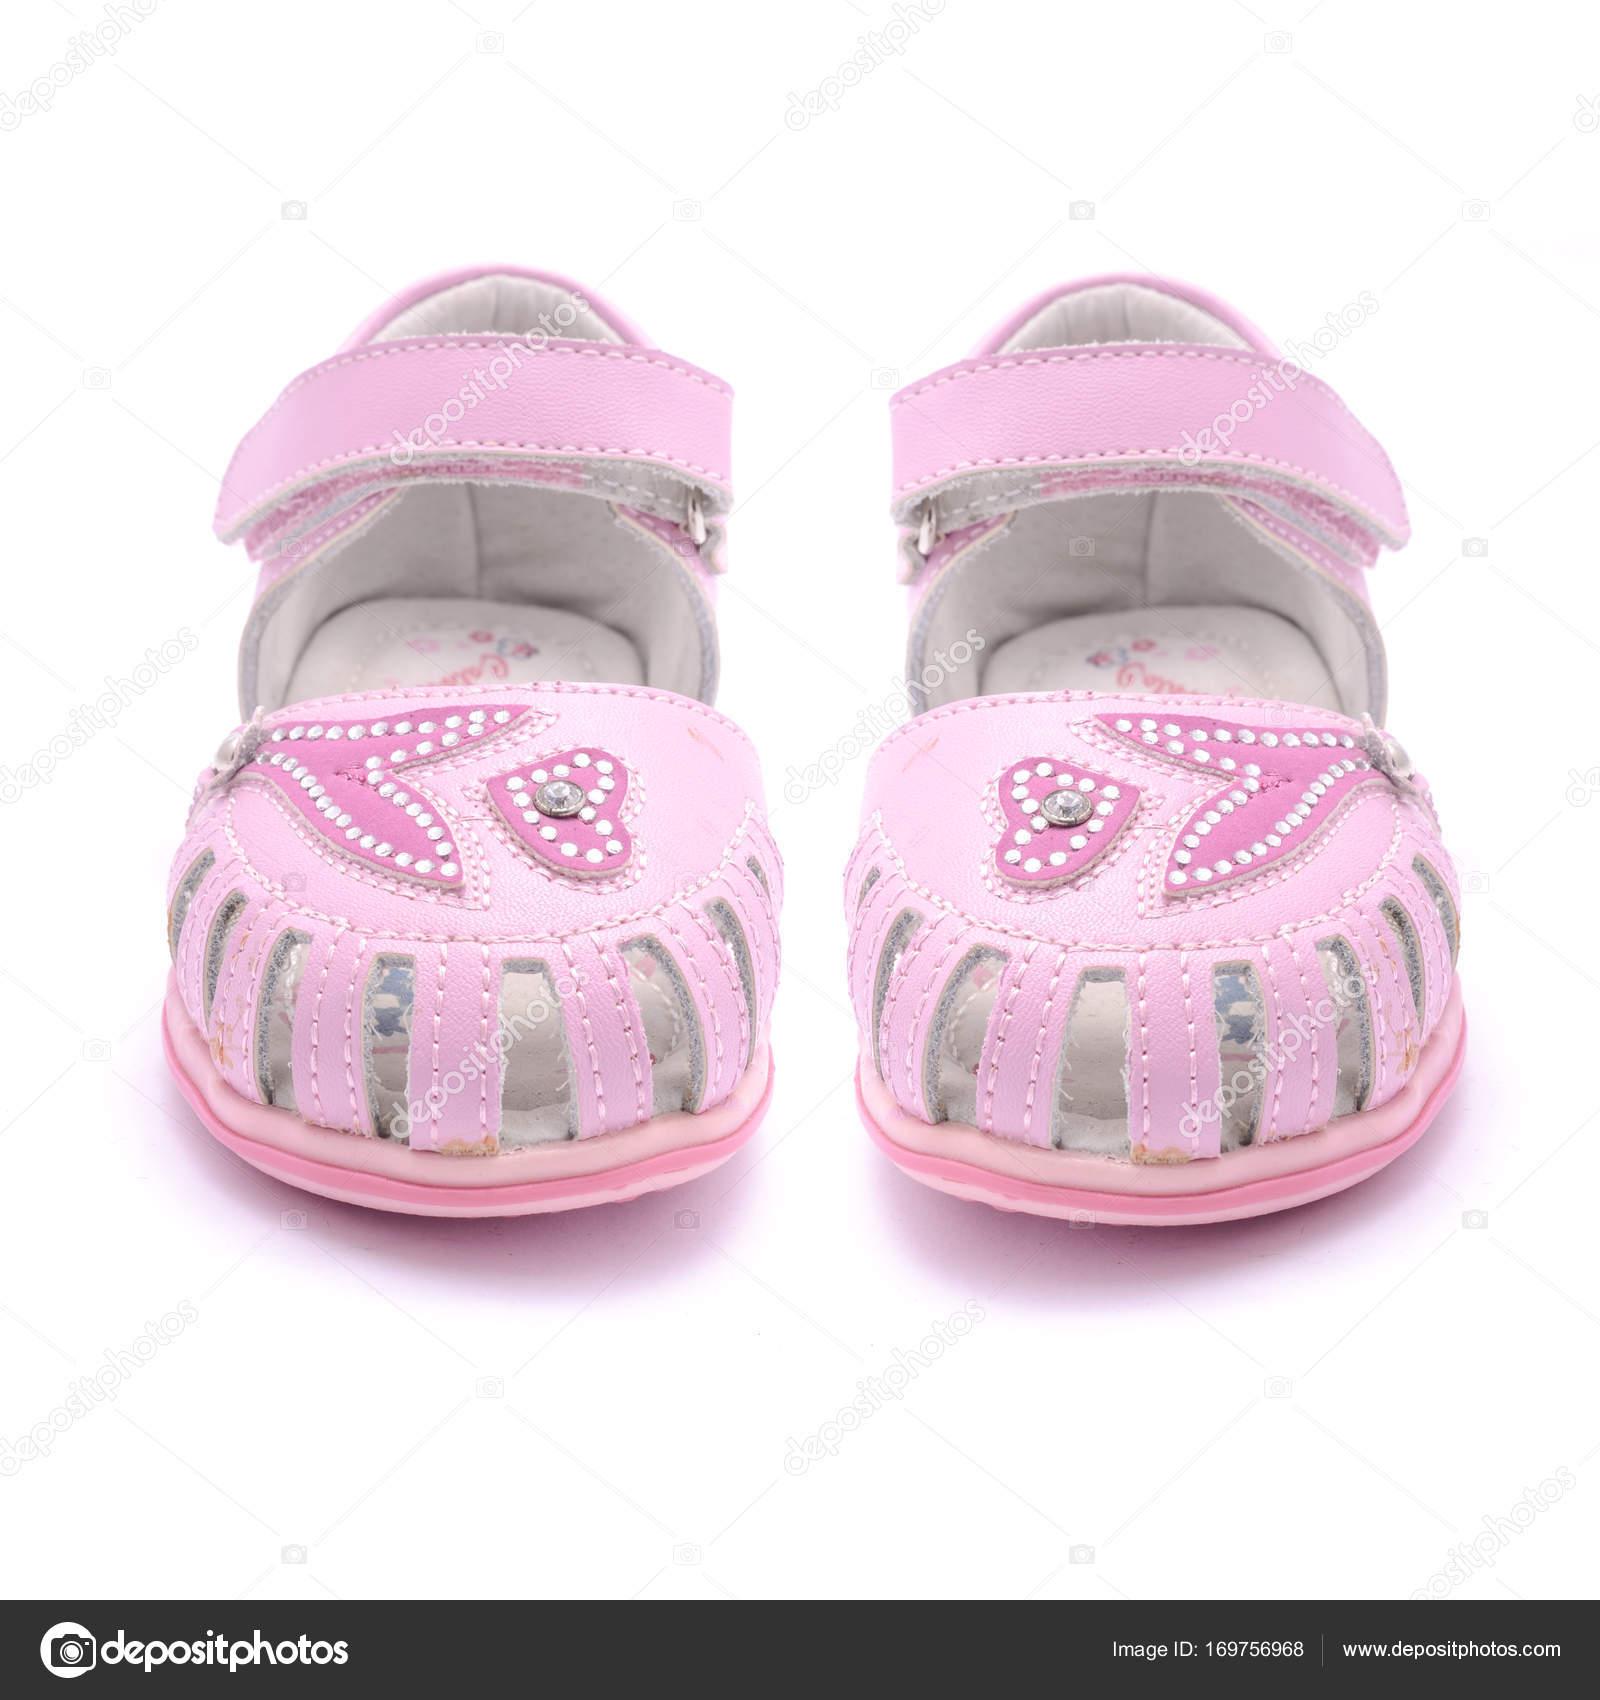 6141054c4b3 Ροζ πέδιλα για το μωρό που απομονώνονται σε λευκό — Φωτογραφία Αρχείου